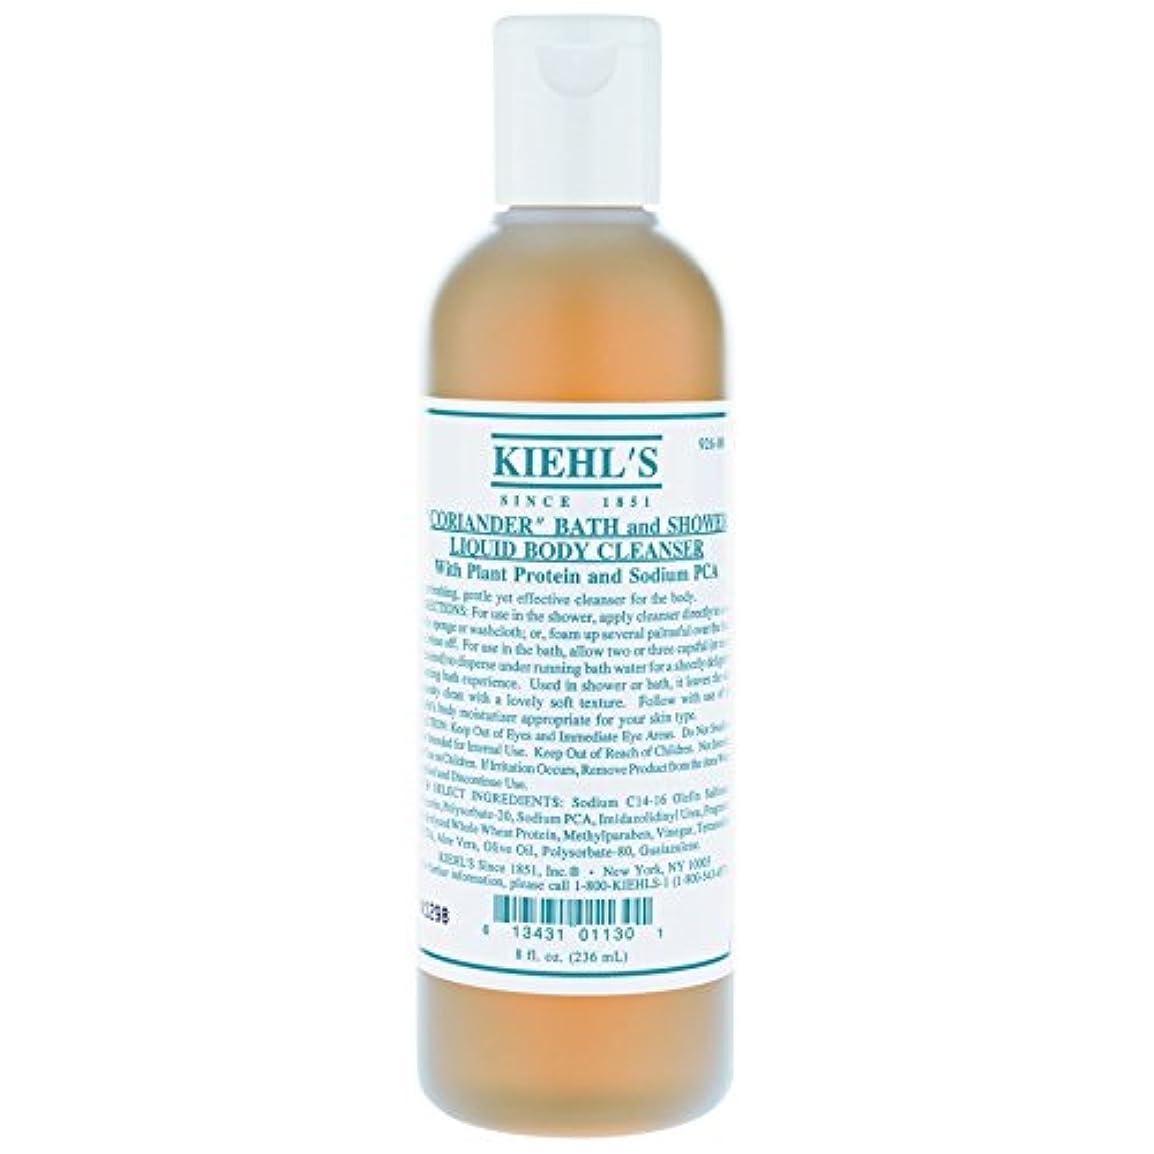 [Kiehl's] キールズコリアンダーバス&シャワー液体ボディクレンザー500ミリリットル - Kiehl's Coriander Bath & Shower Liquid Body Cleanser 500ml [並行輸入品]